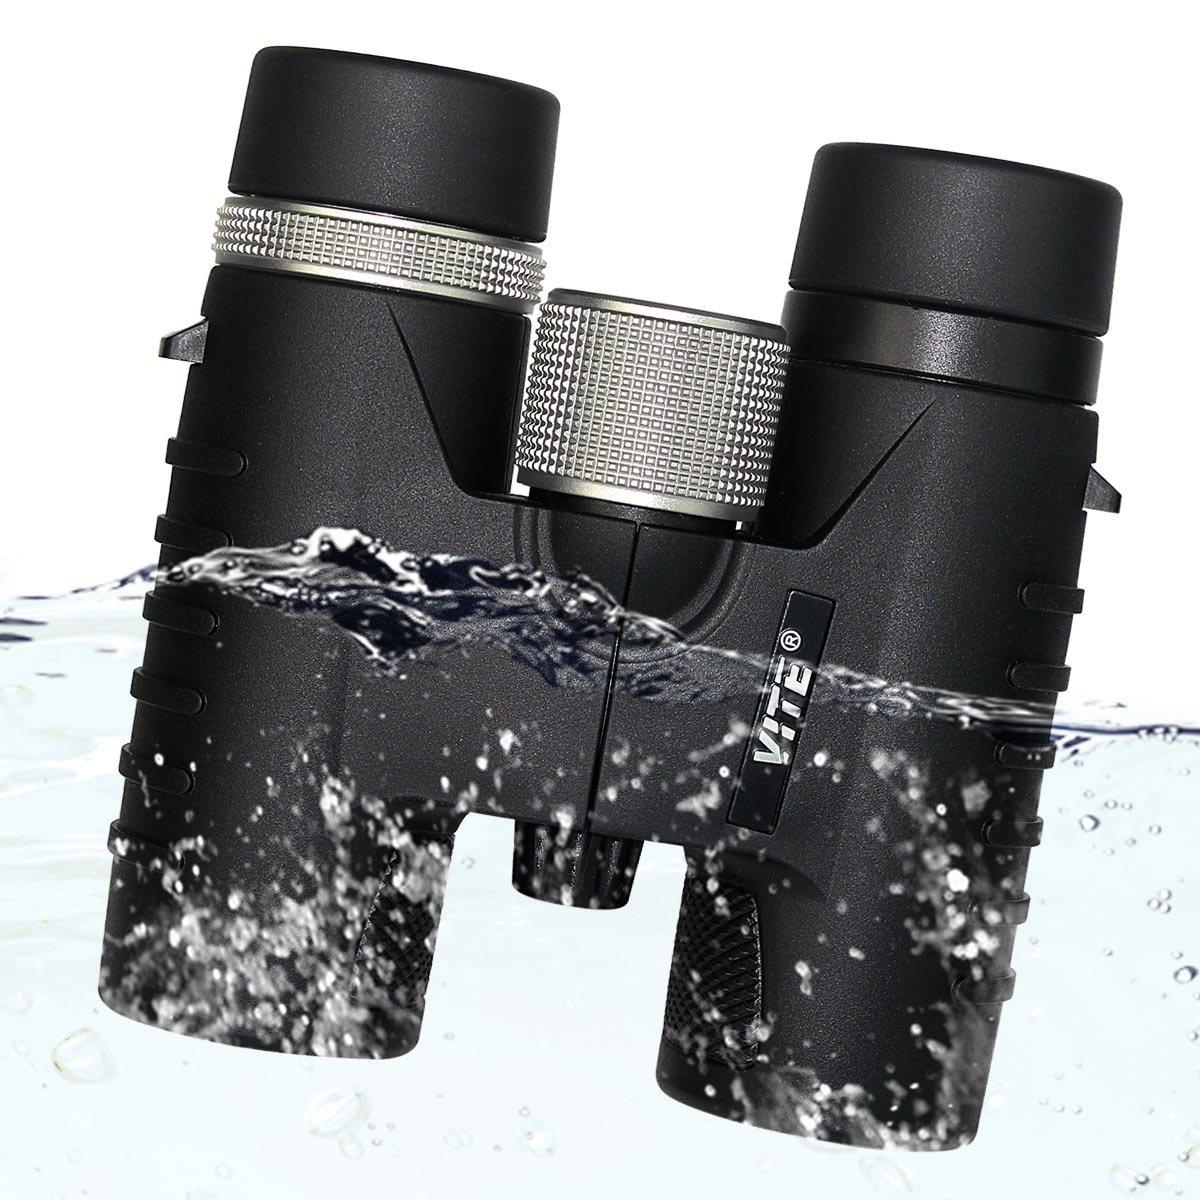 Vite VT 22双眼鏡8 x 32 8 x 42 10 x 32 10 x 42 mm防水Fogproof bak4ルーフプリズムHD Clarity for Shooting Hunting Bird Watchingアウトドア B01EH3ZWAI 10x32 10x32